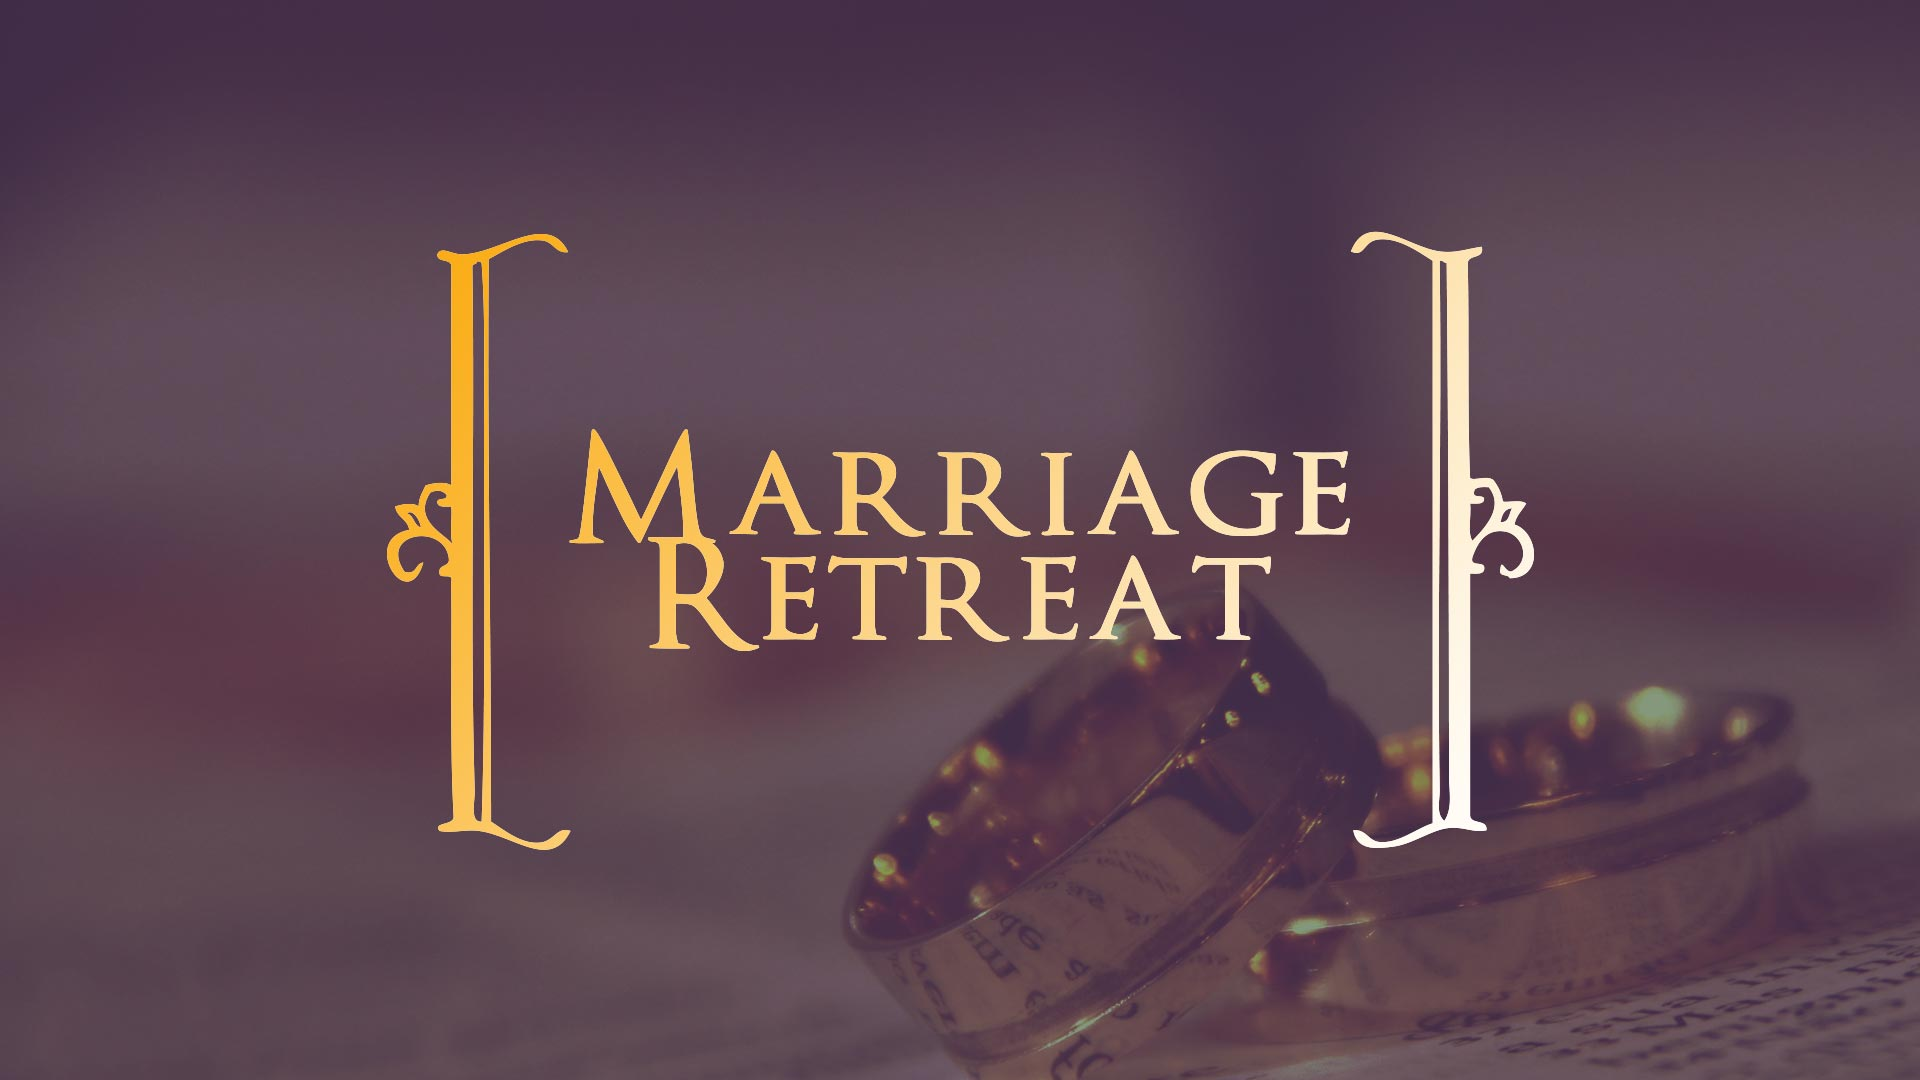 Marriage retreat 2018 1920x1080 3